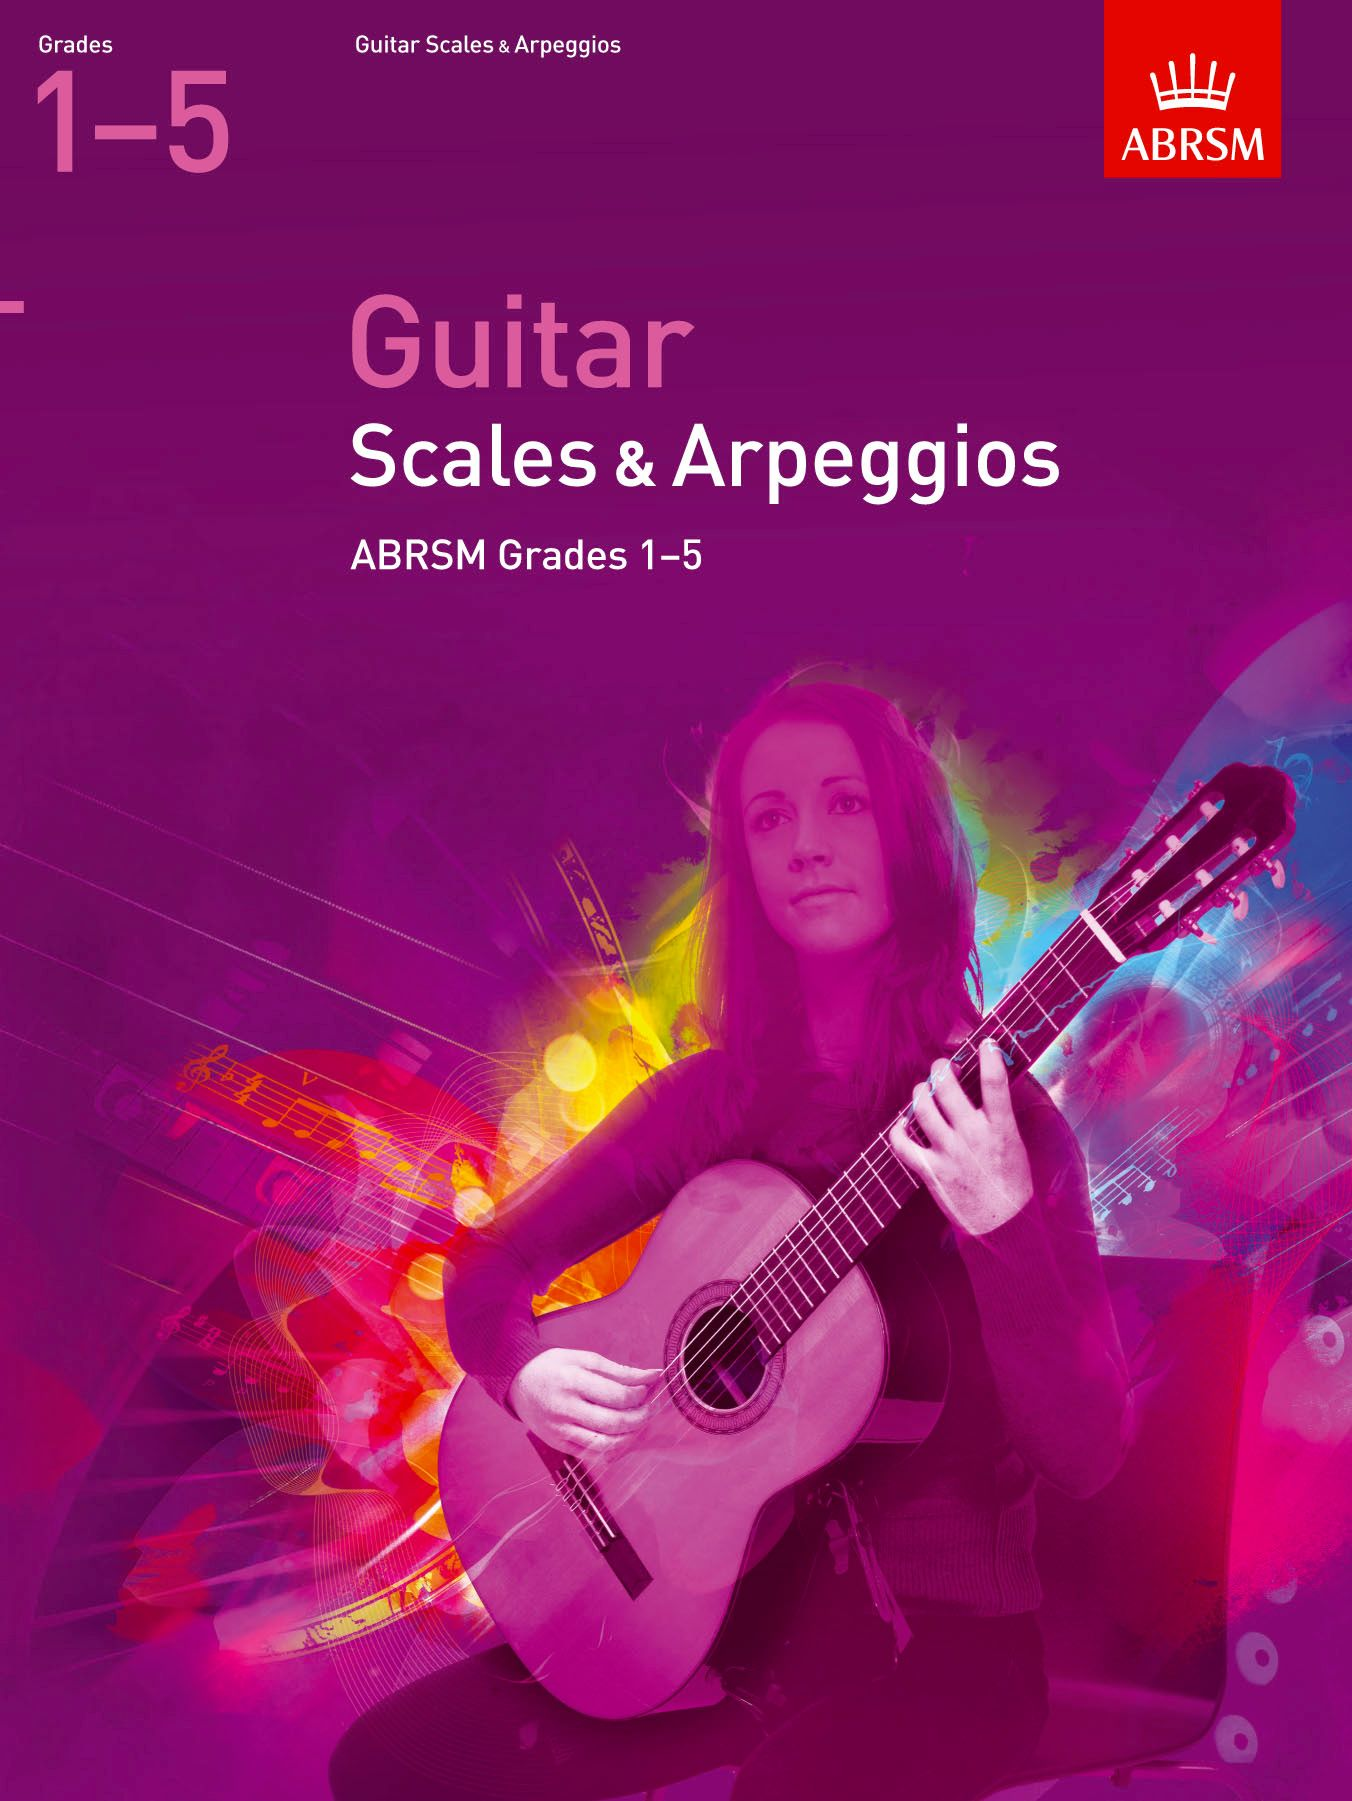 ABRSM Guitar Scales and Arpeggios Grades 1 - 5